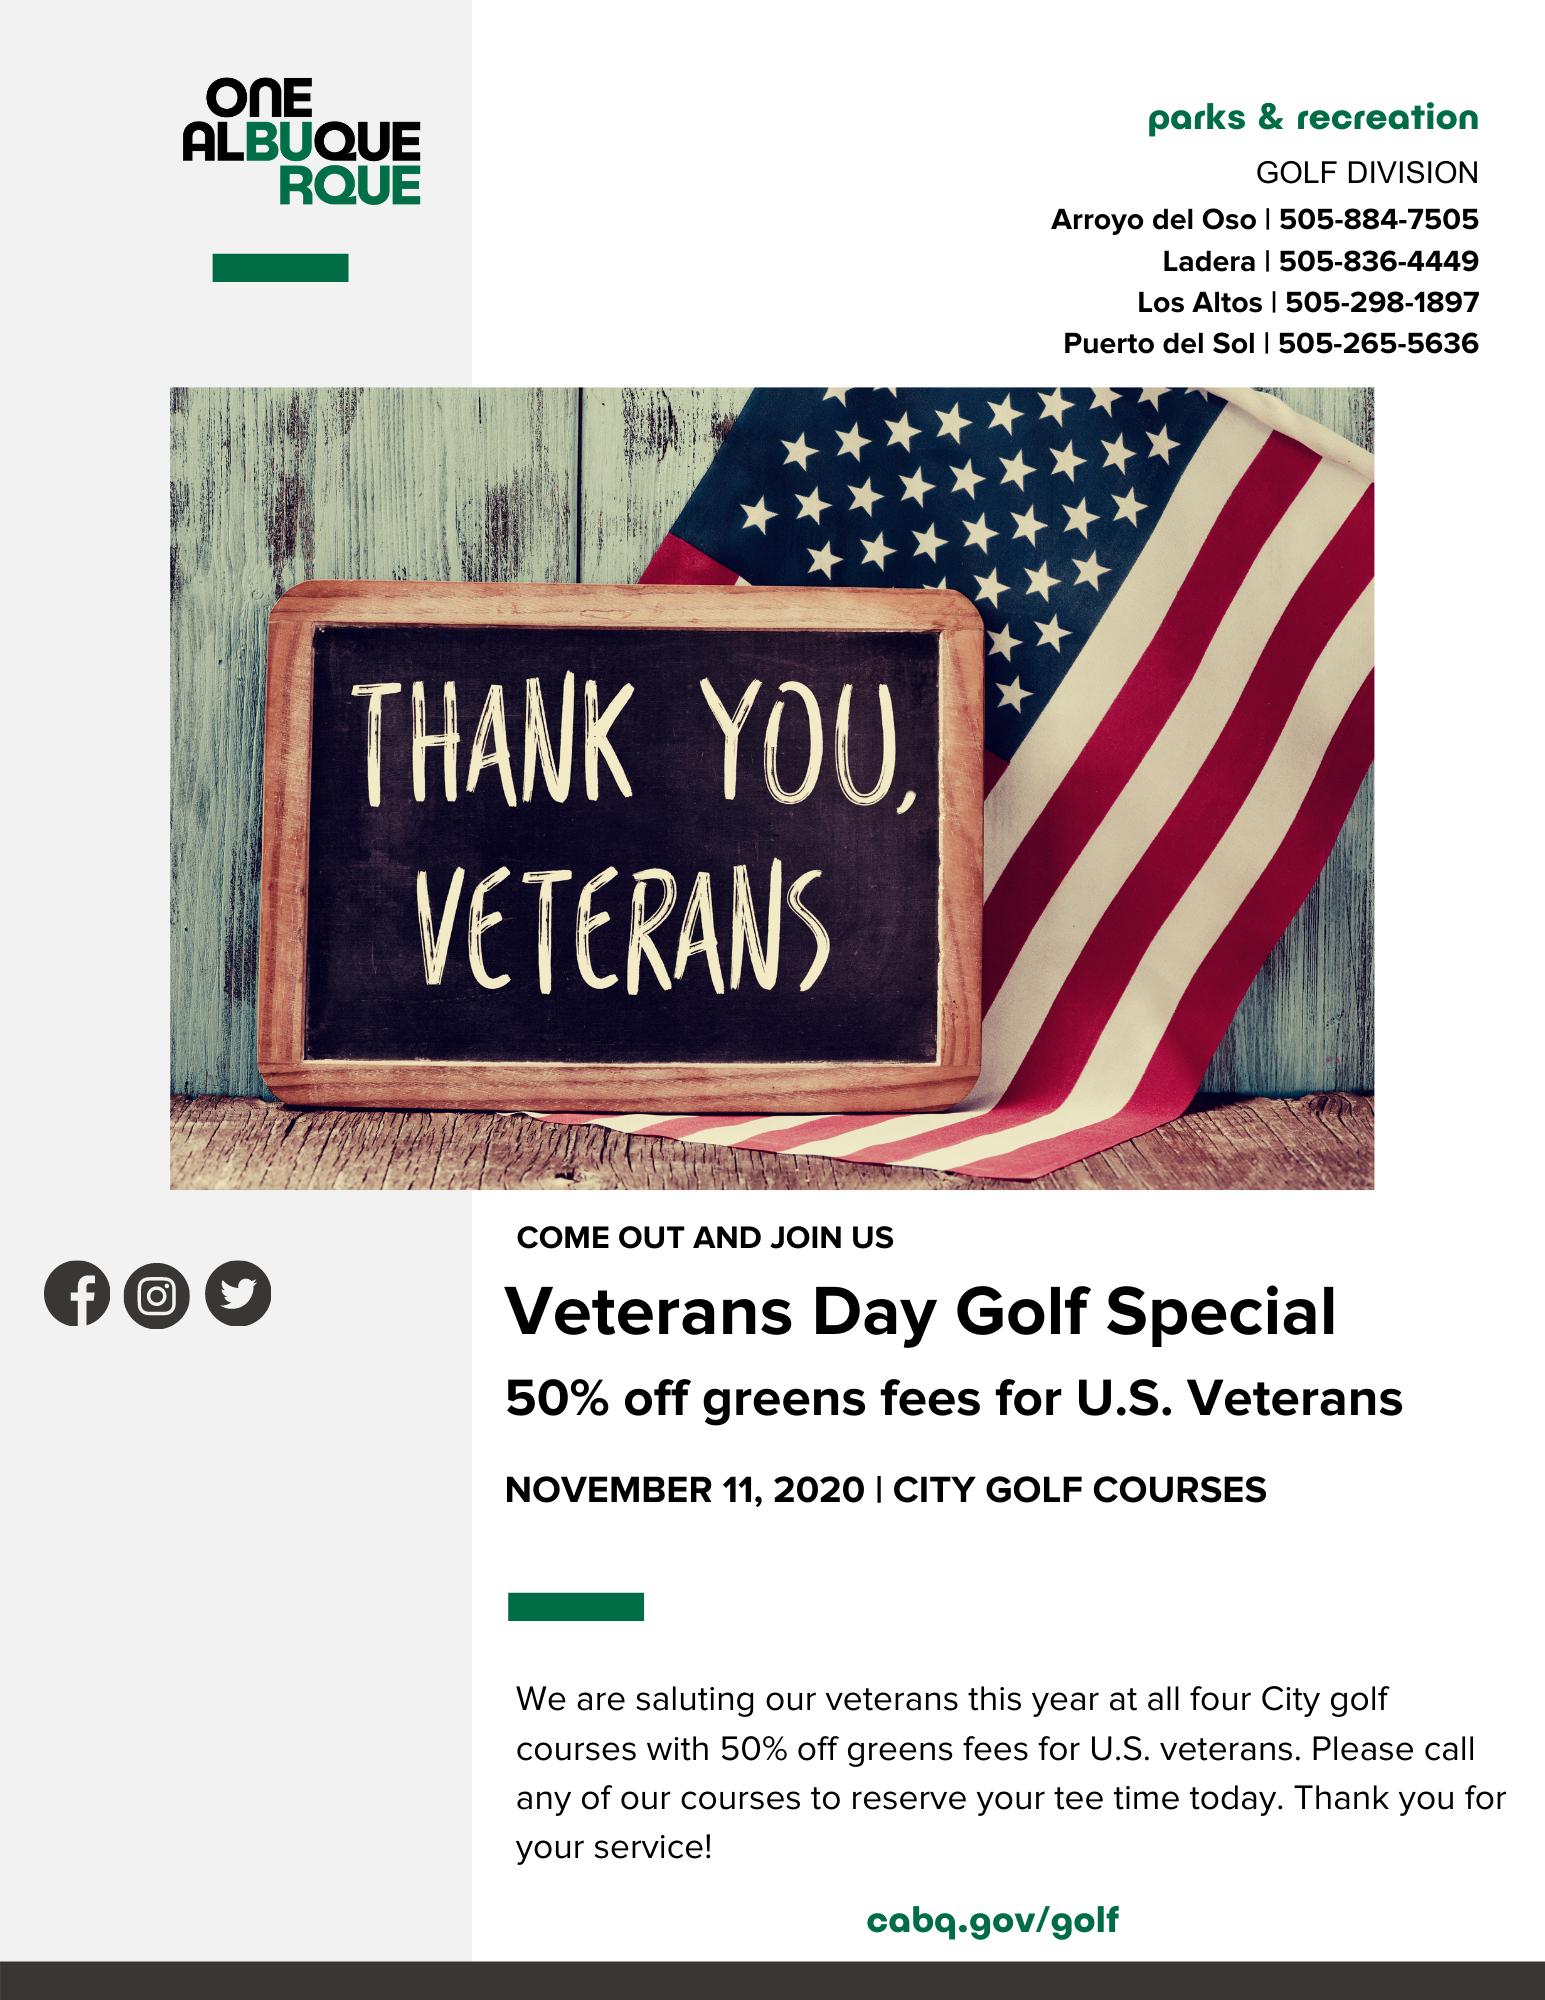 2020 Veterans Day Golf Special